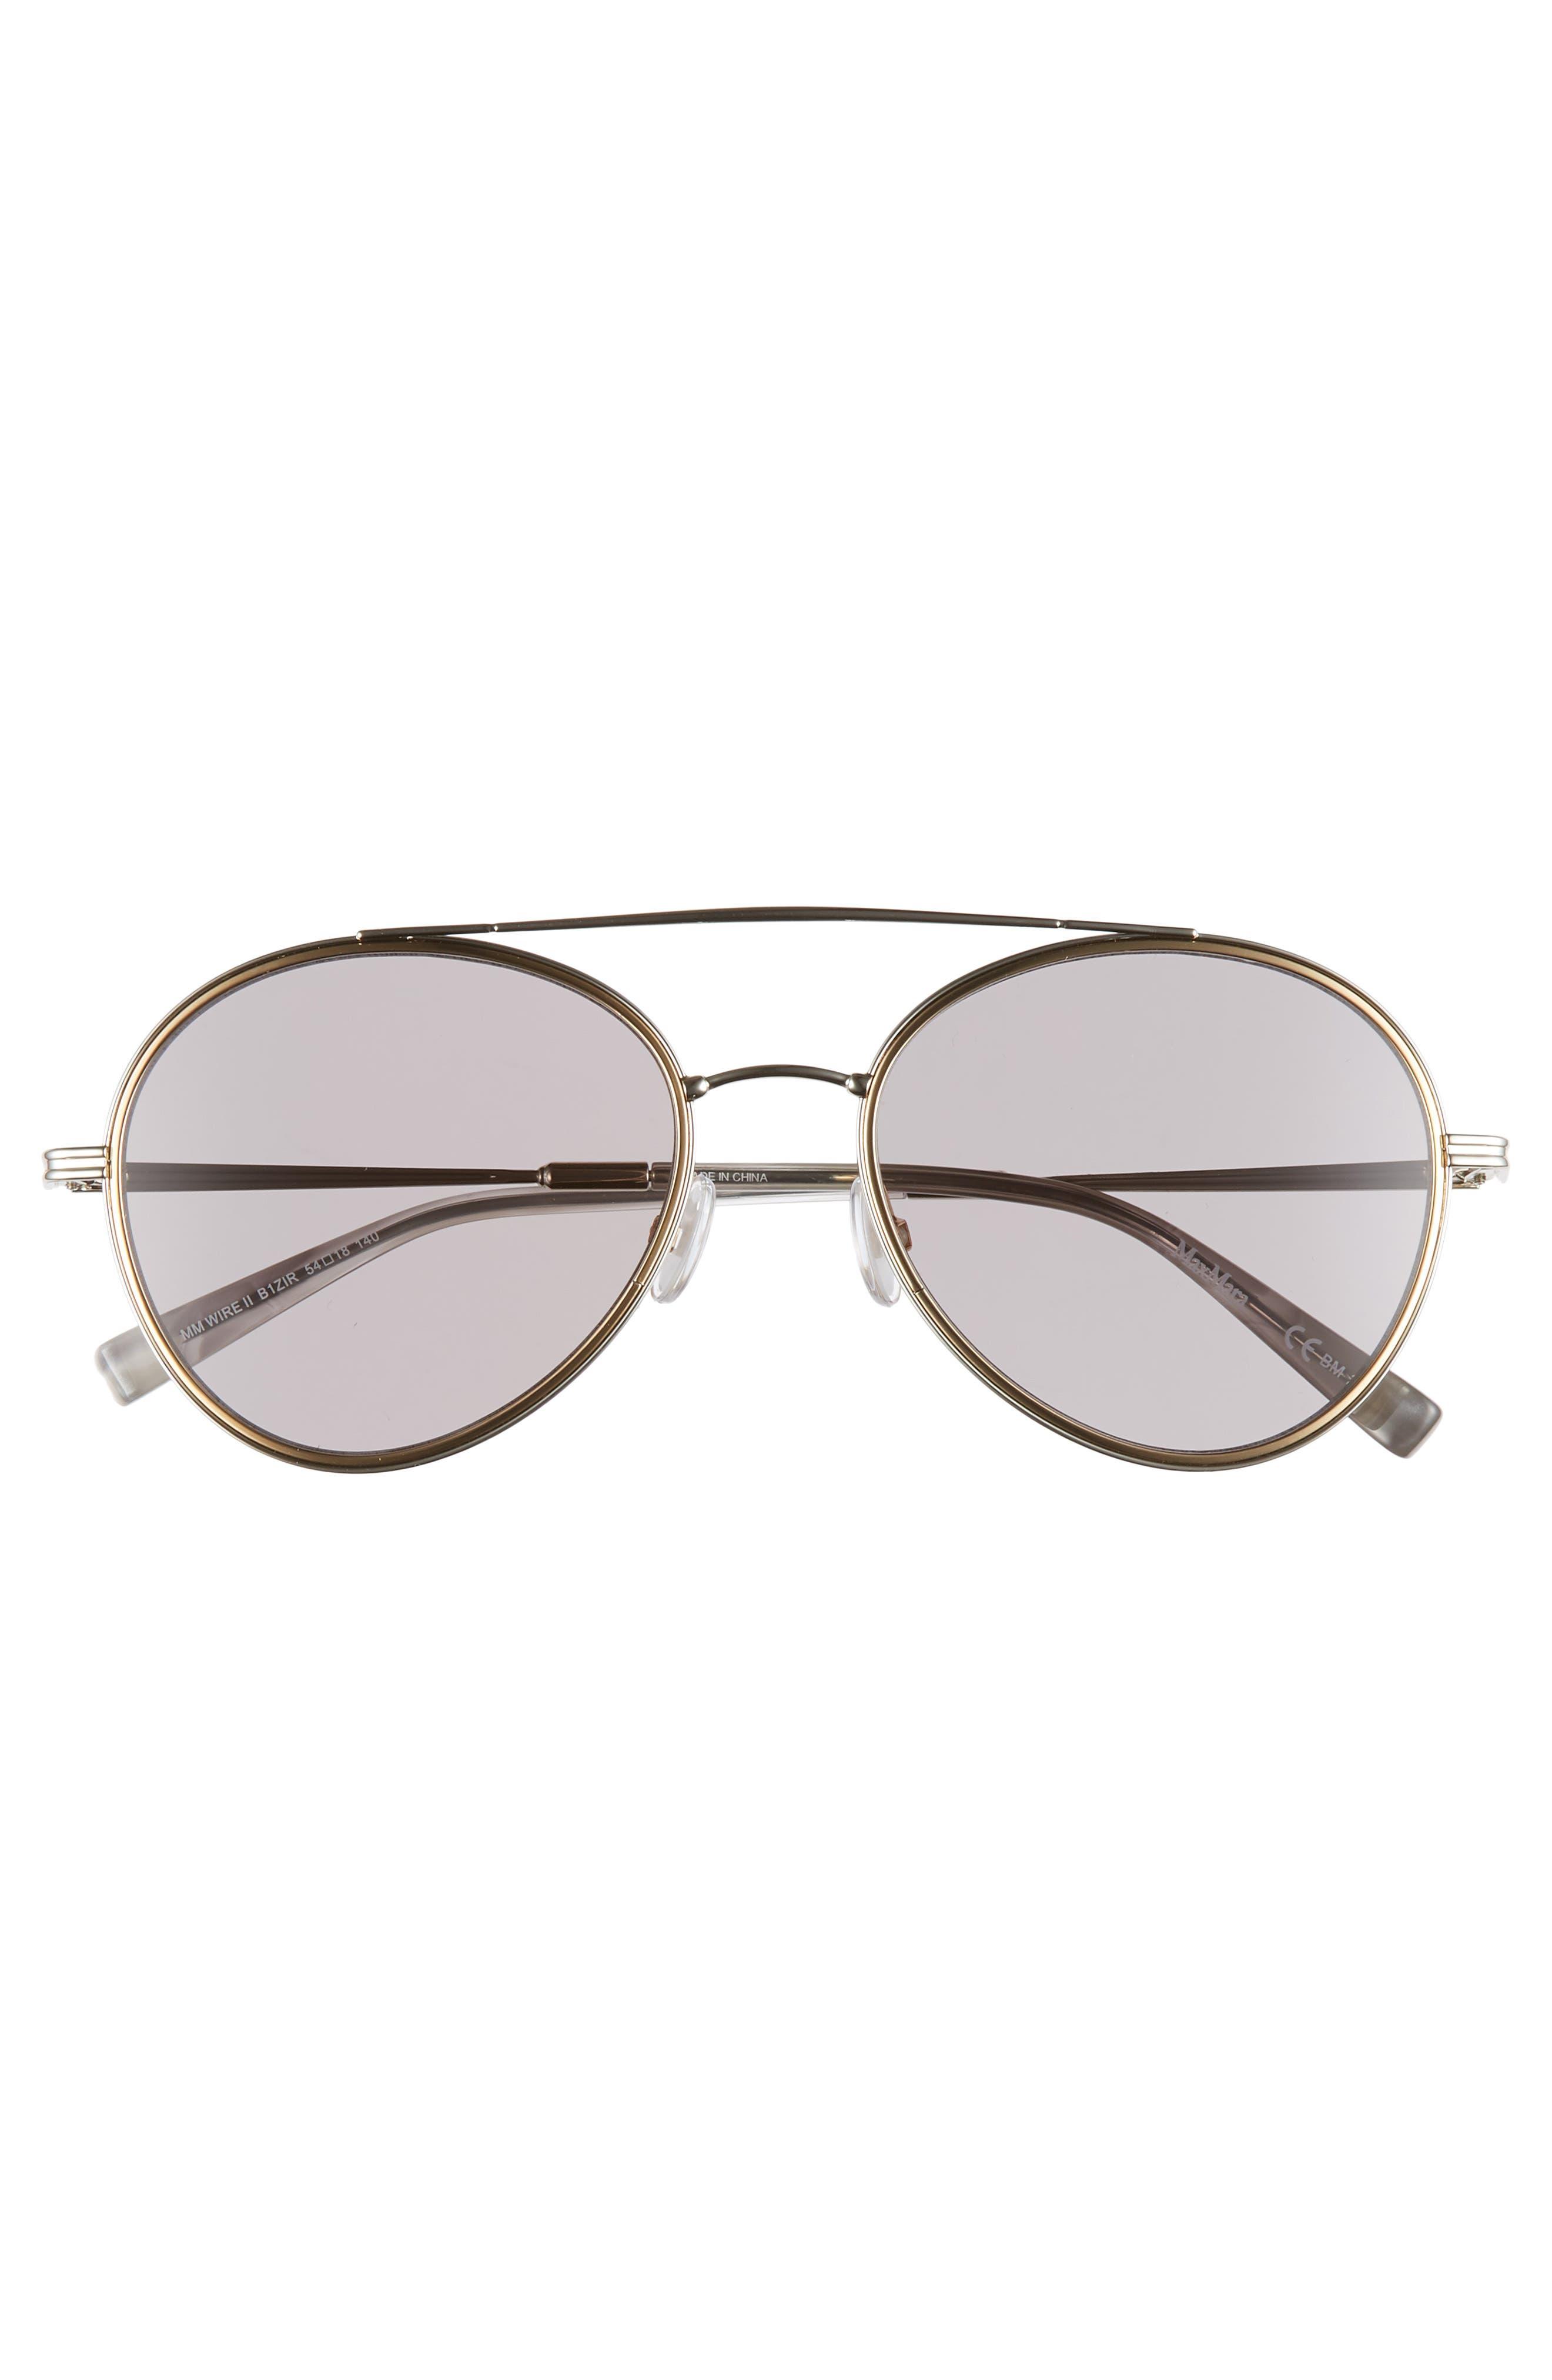 Wire II 54mm Aviator Sunglasses,                             Alternate thumbnail 3, color,                             SILVER